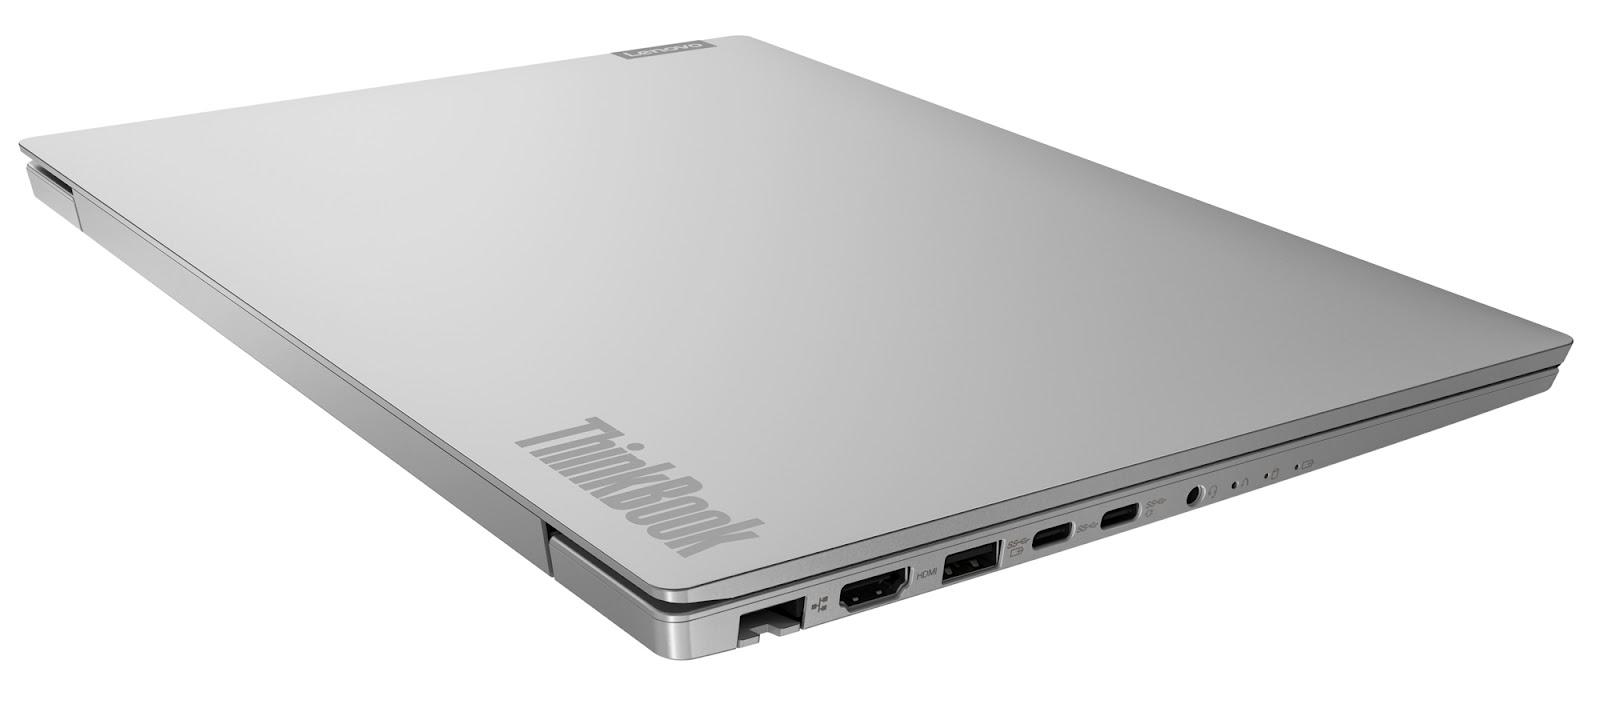 Фото 3. Ноутбук Lenovo ThinkBook 14 IIL (20SL000LRU)